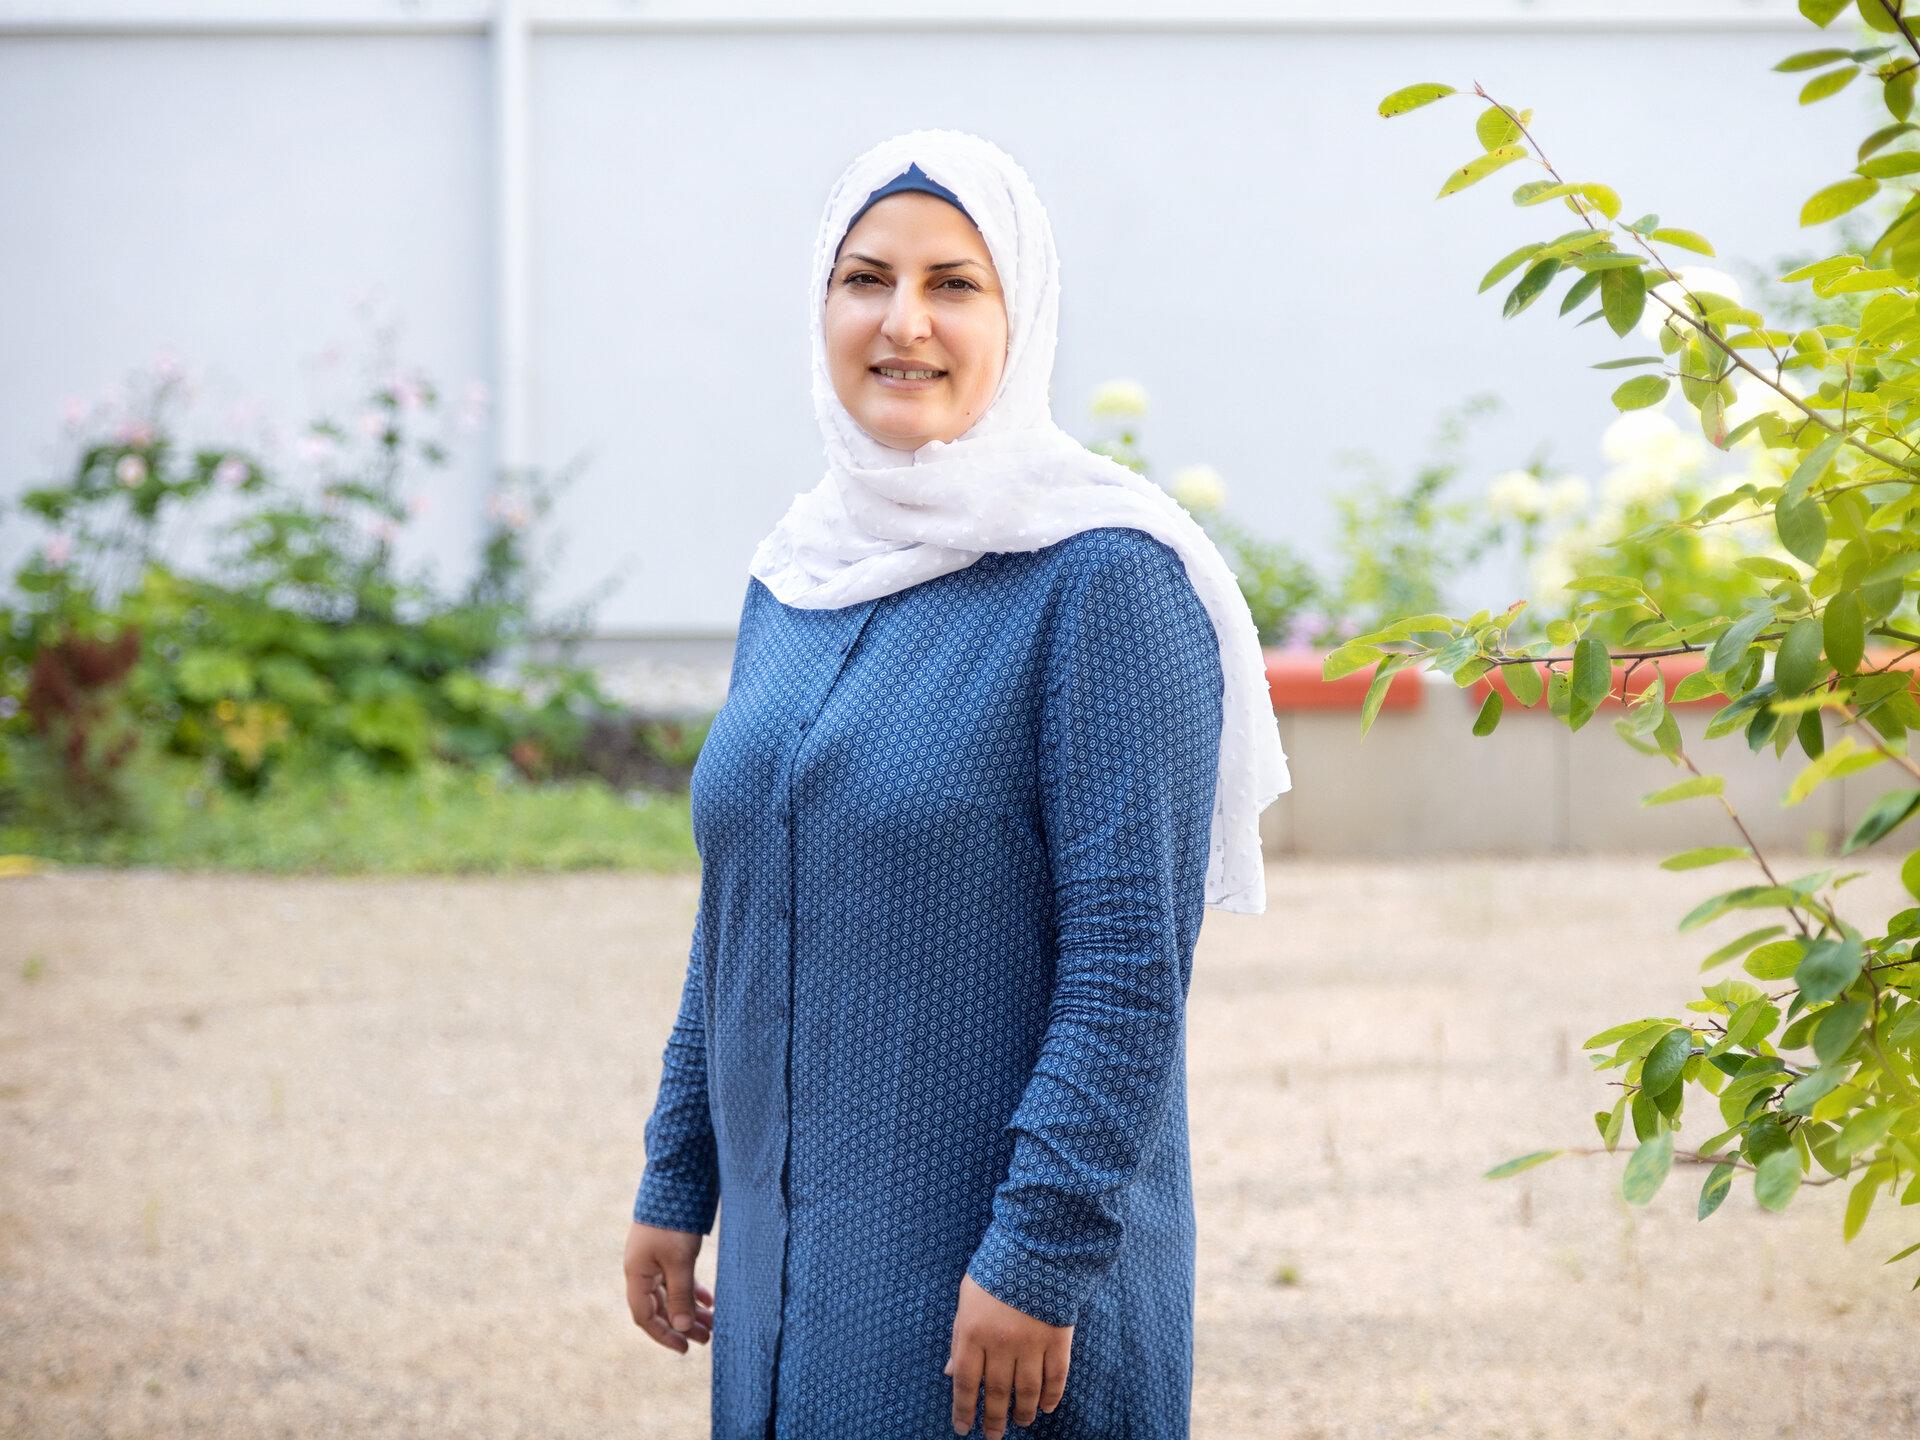 Frau Al Saaede